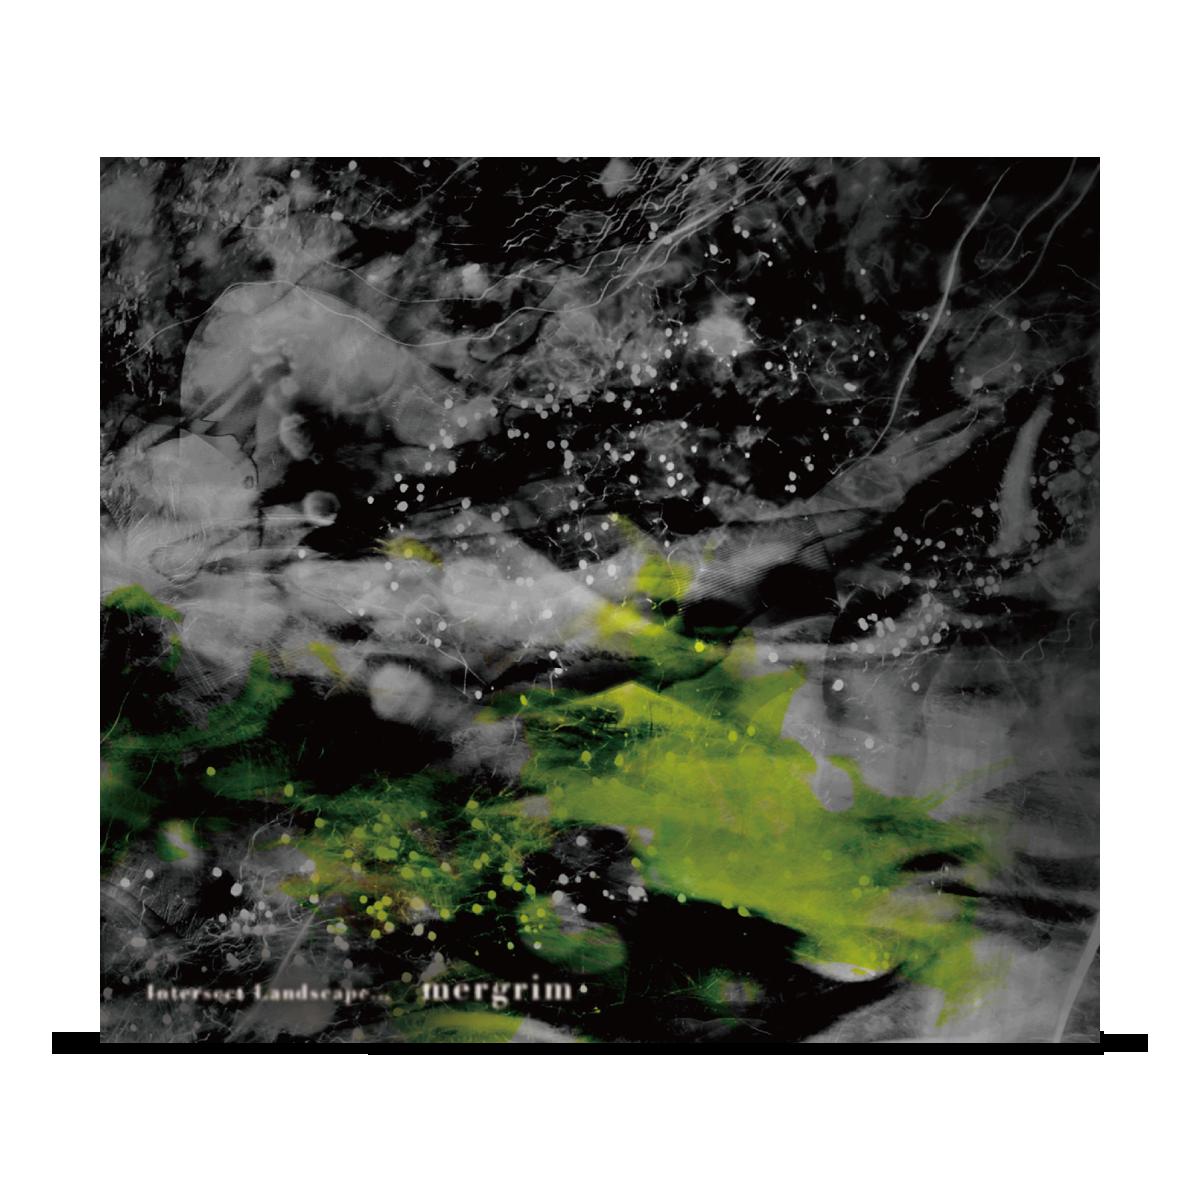 Intersect Landscape… / mergrim